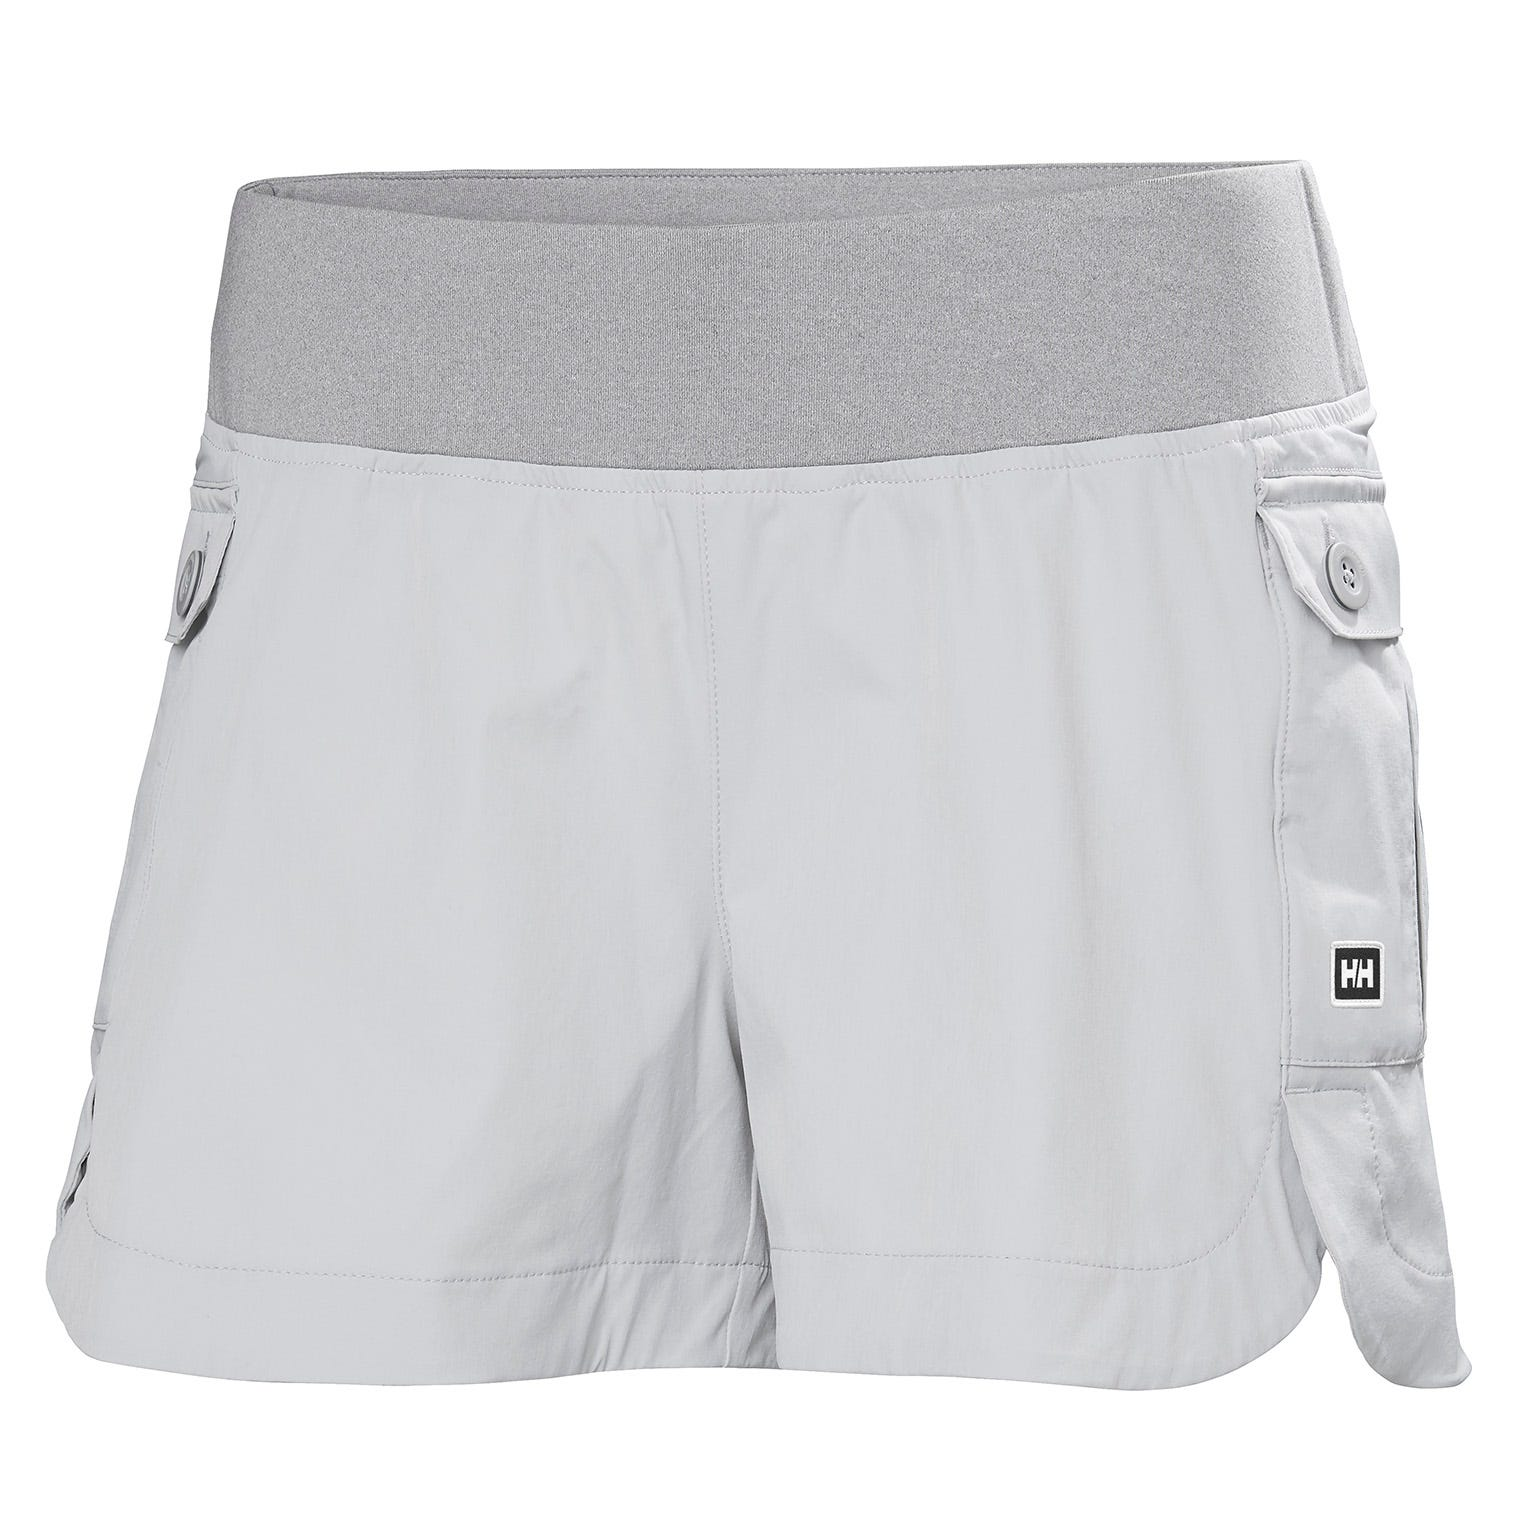 Womens Vetta Quick-dry Stretch Shorts | Uk Helly Hansen Womens Hiking Trouser Grey XS